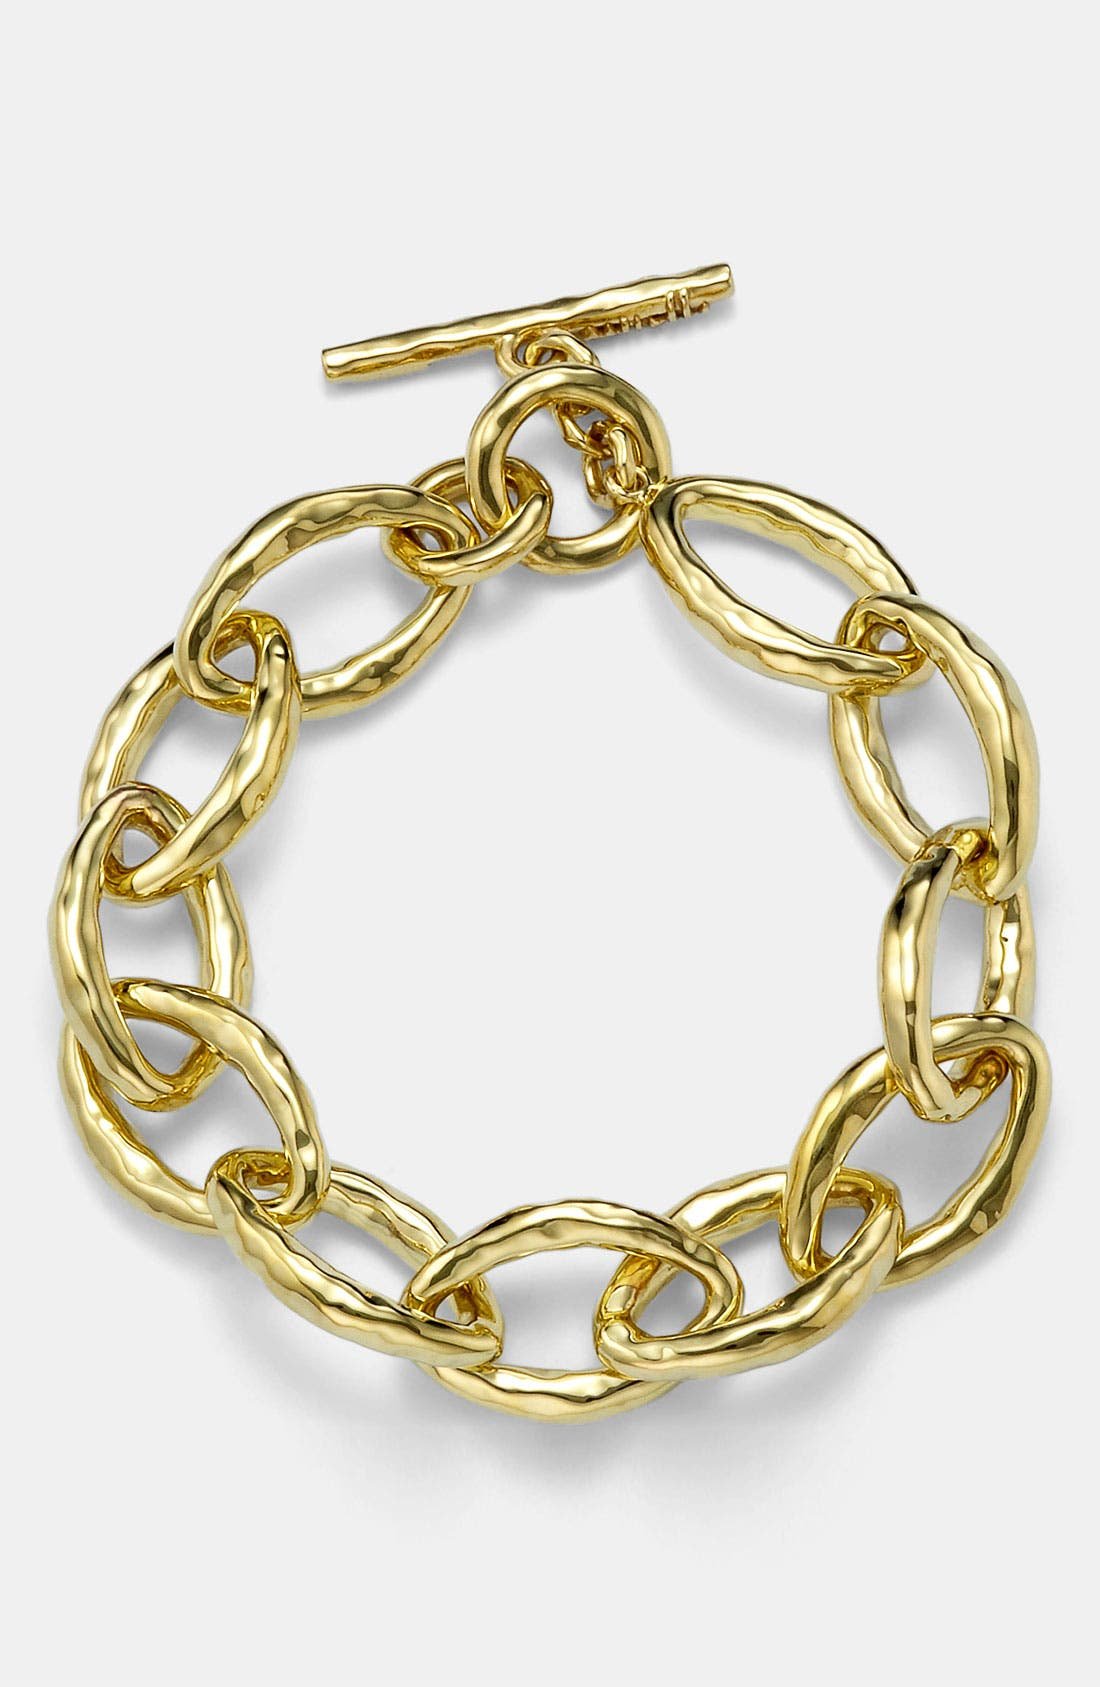 Alternate Image 1 Selected - Ippolita 'Glamazon' 18k Gold Link Bracelet